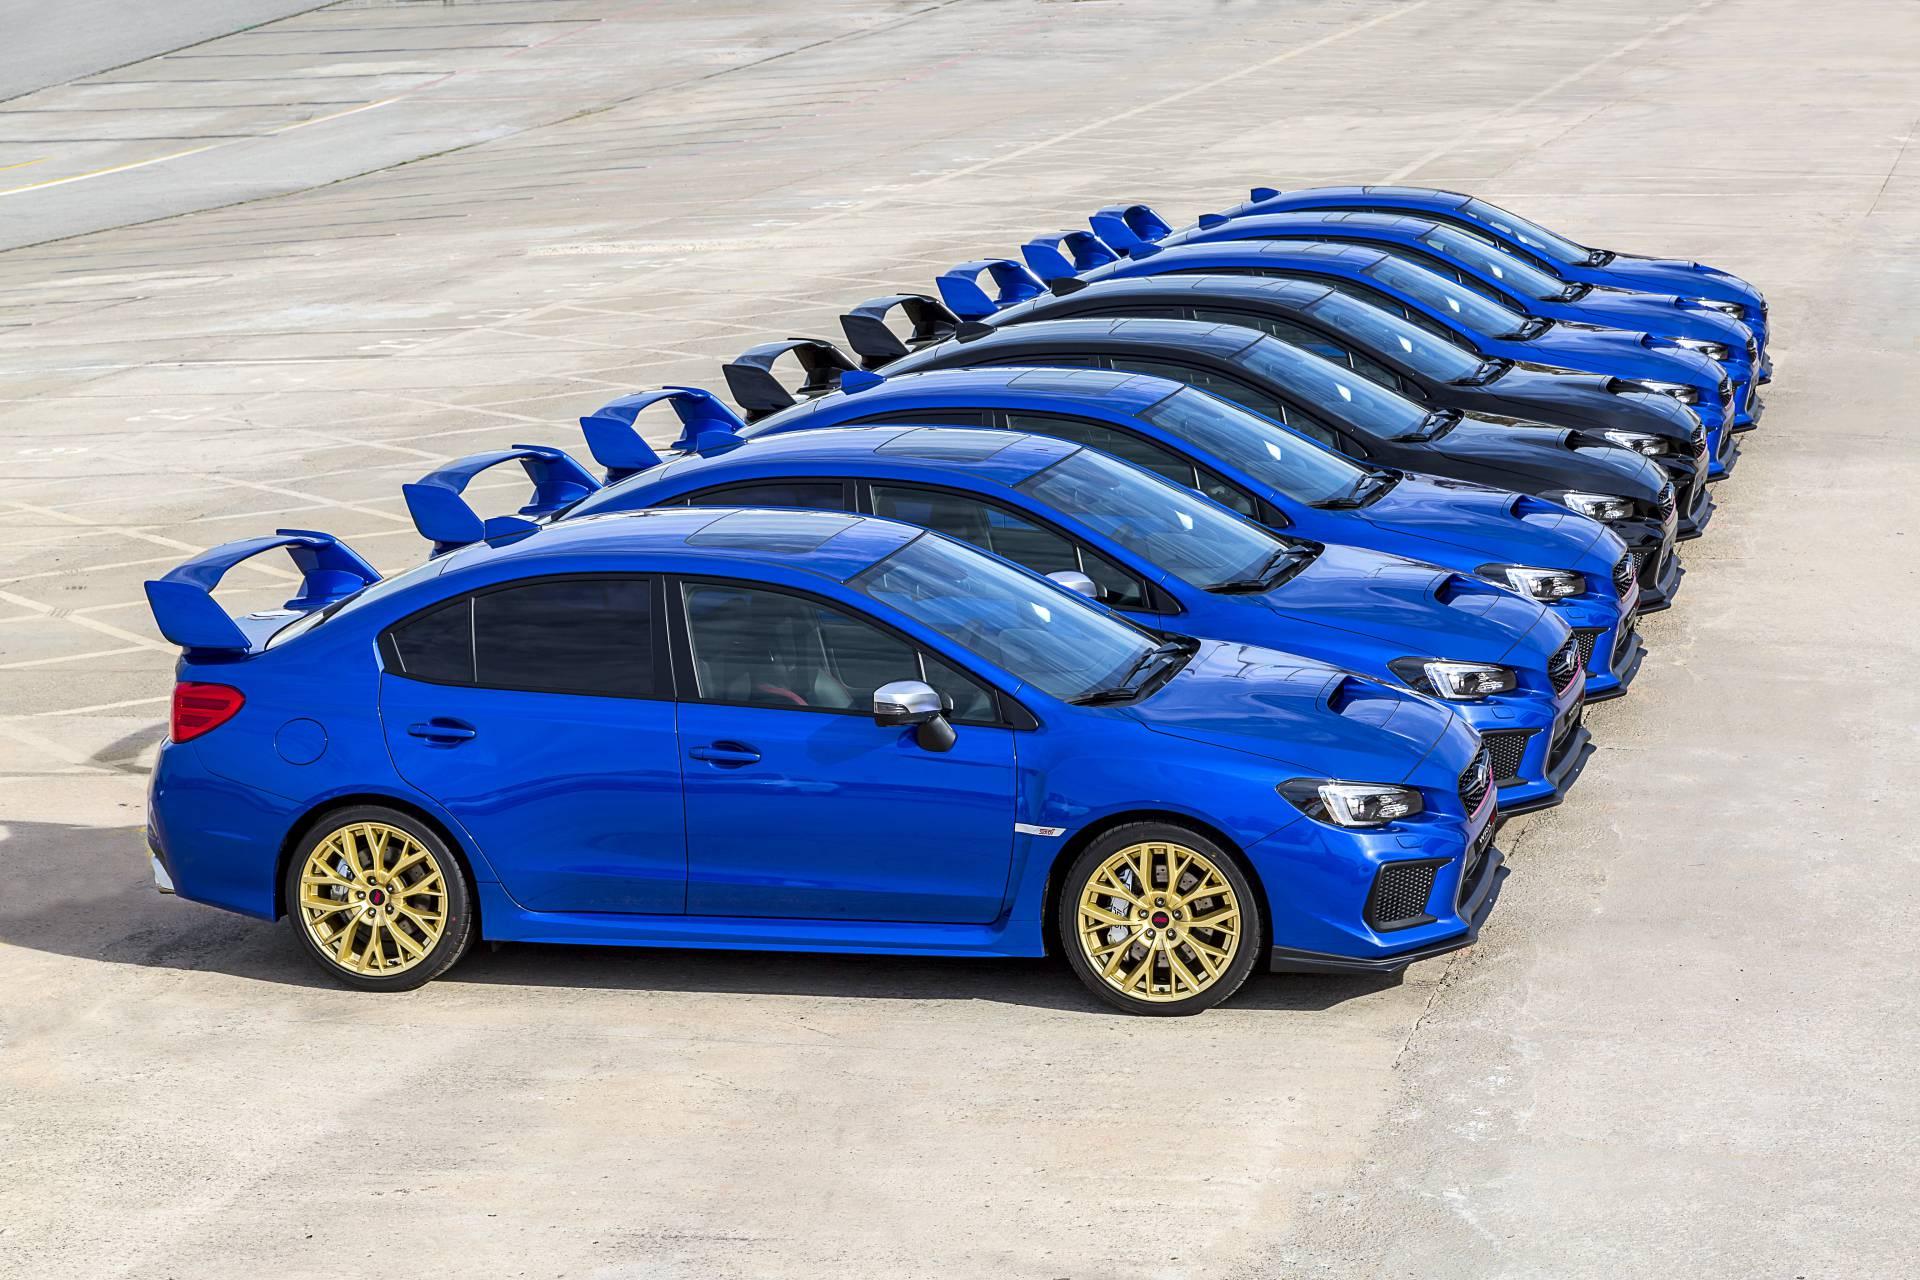 Subaru_WRX_STI_Final_Edition_0027